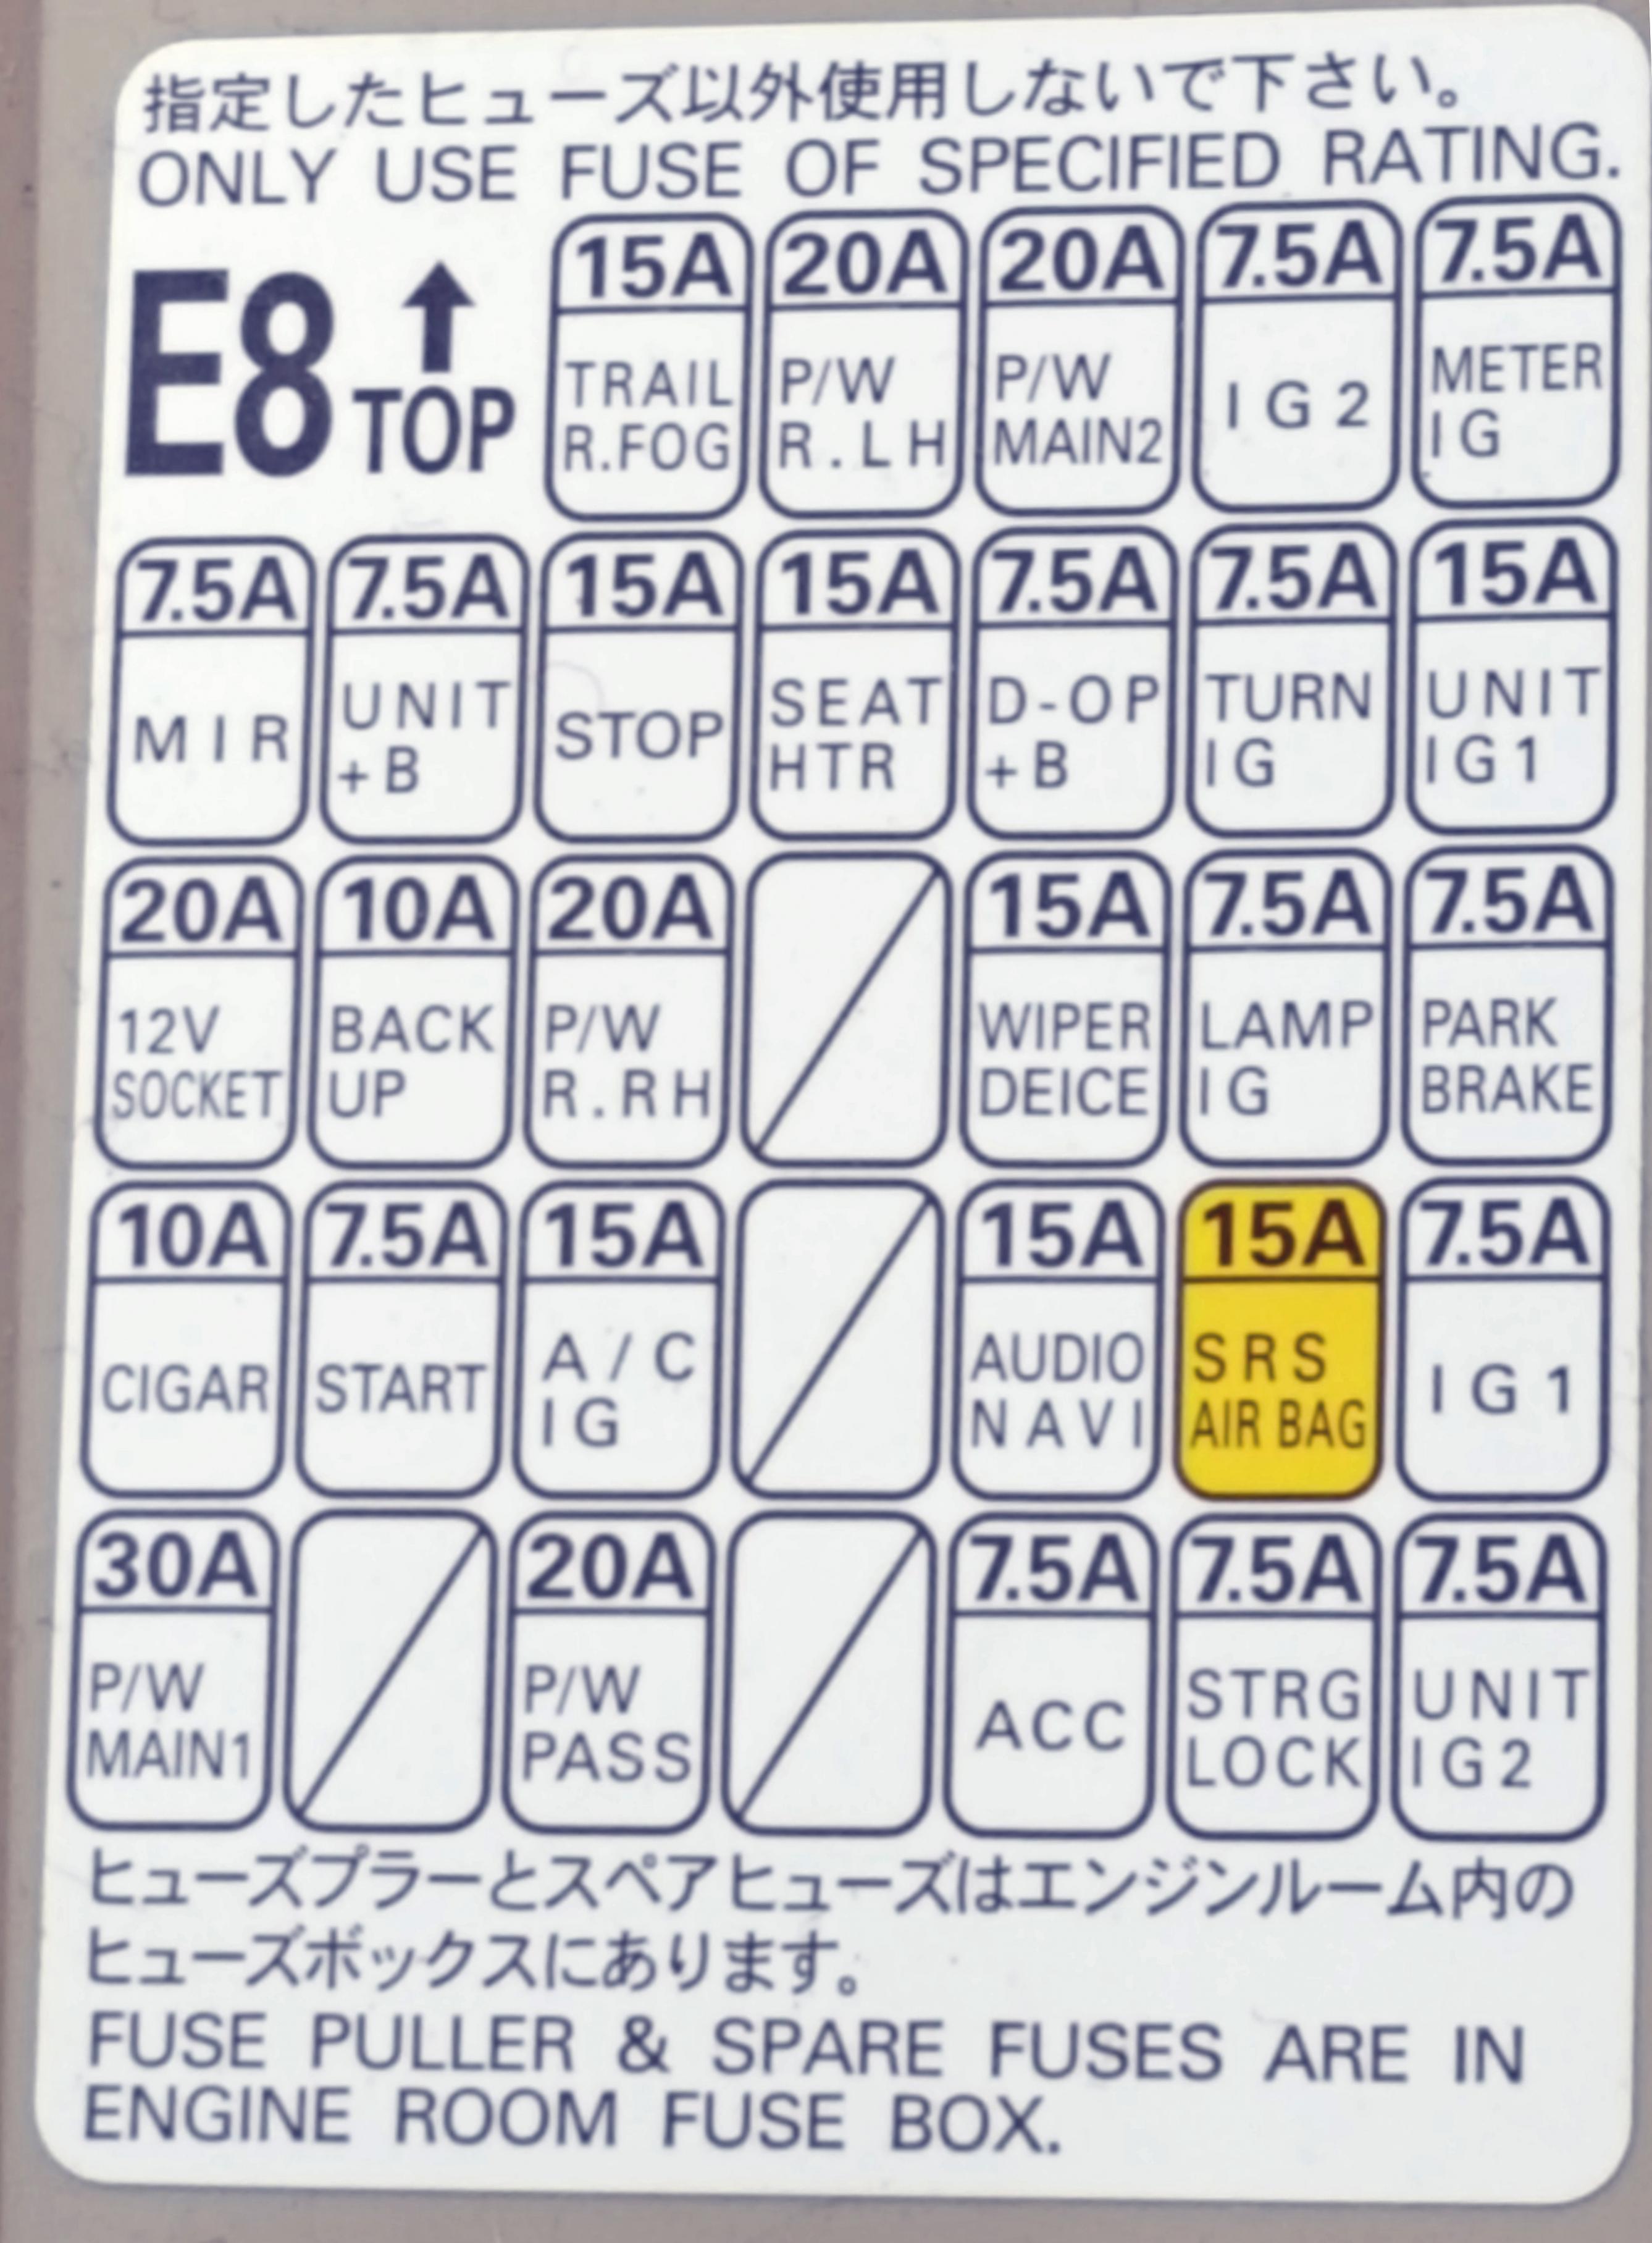 2005 Subaru Outback Fuse Box - Wiring Diagrams Dock